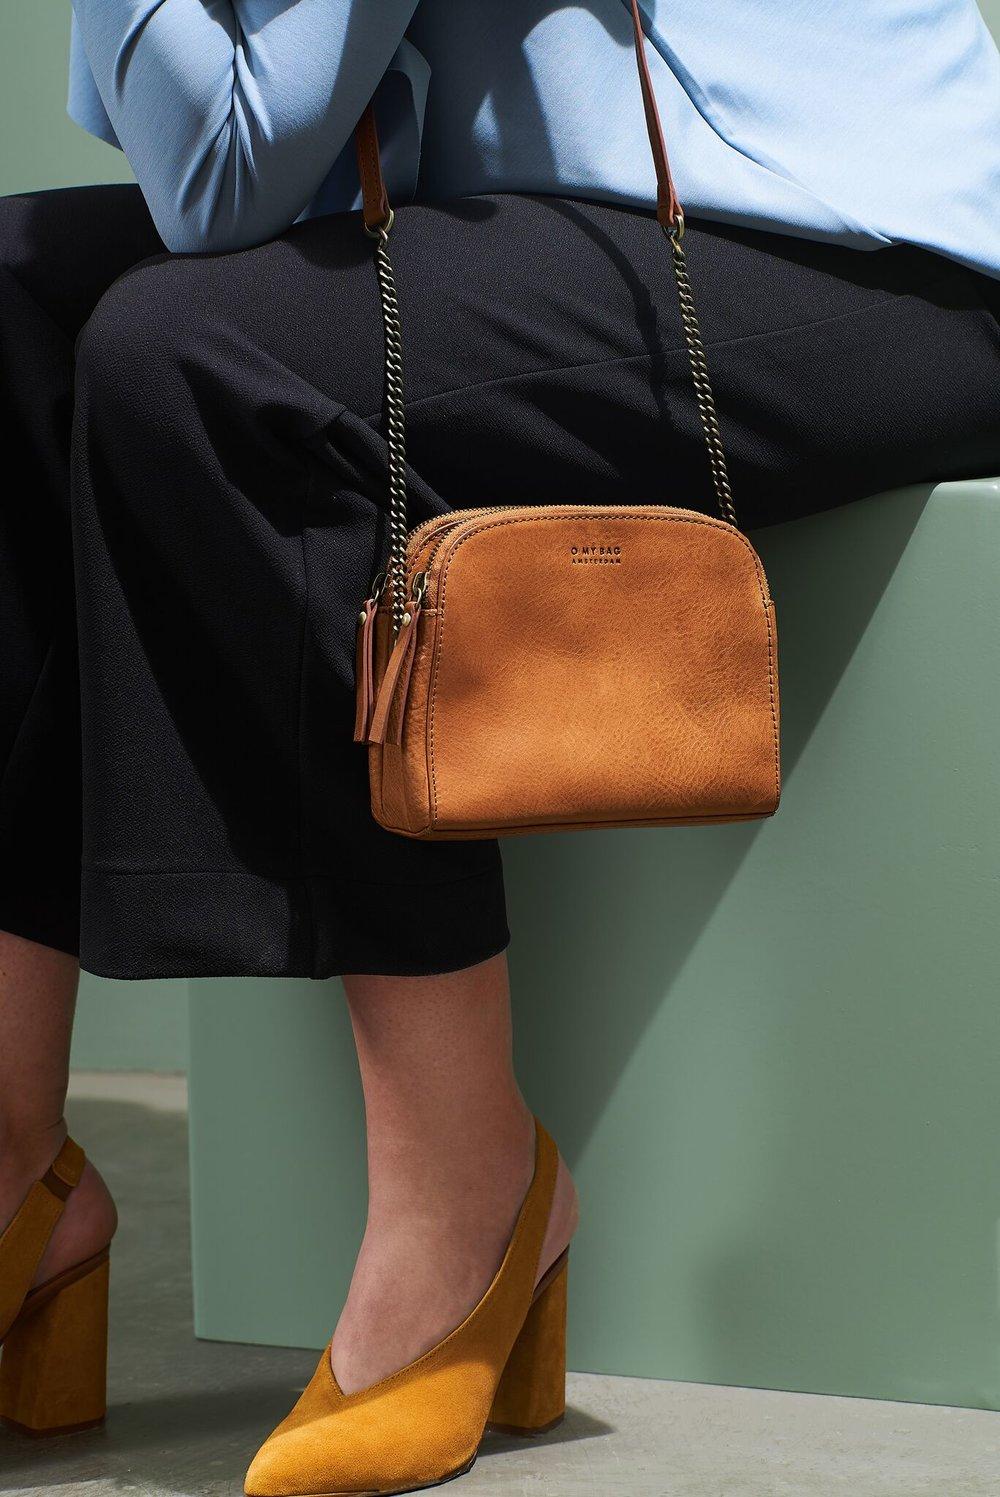 22139a090ff O My Bag: stijlvolle eco-friendly handtassen om mee te pronken — Frau